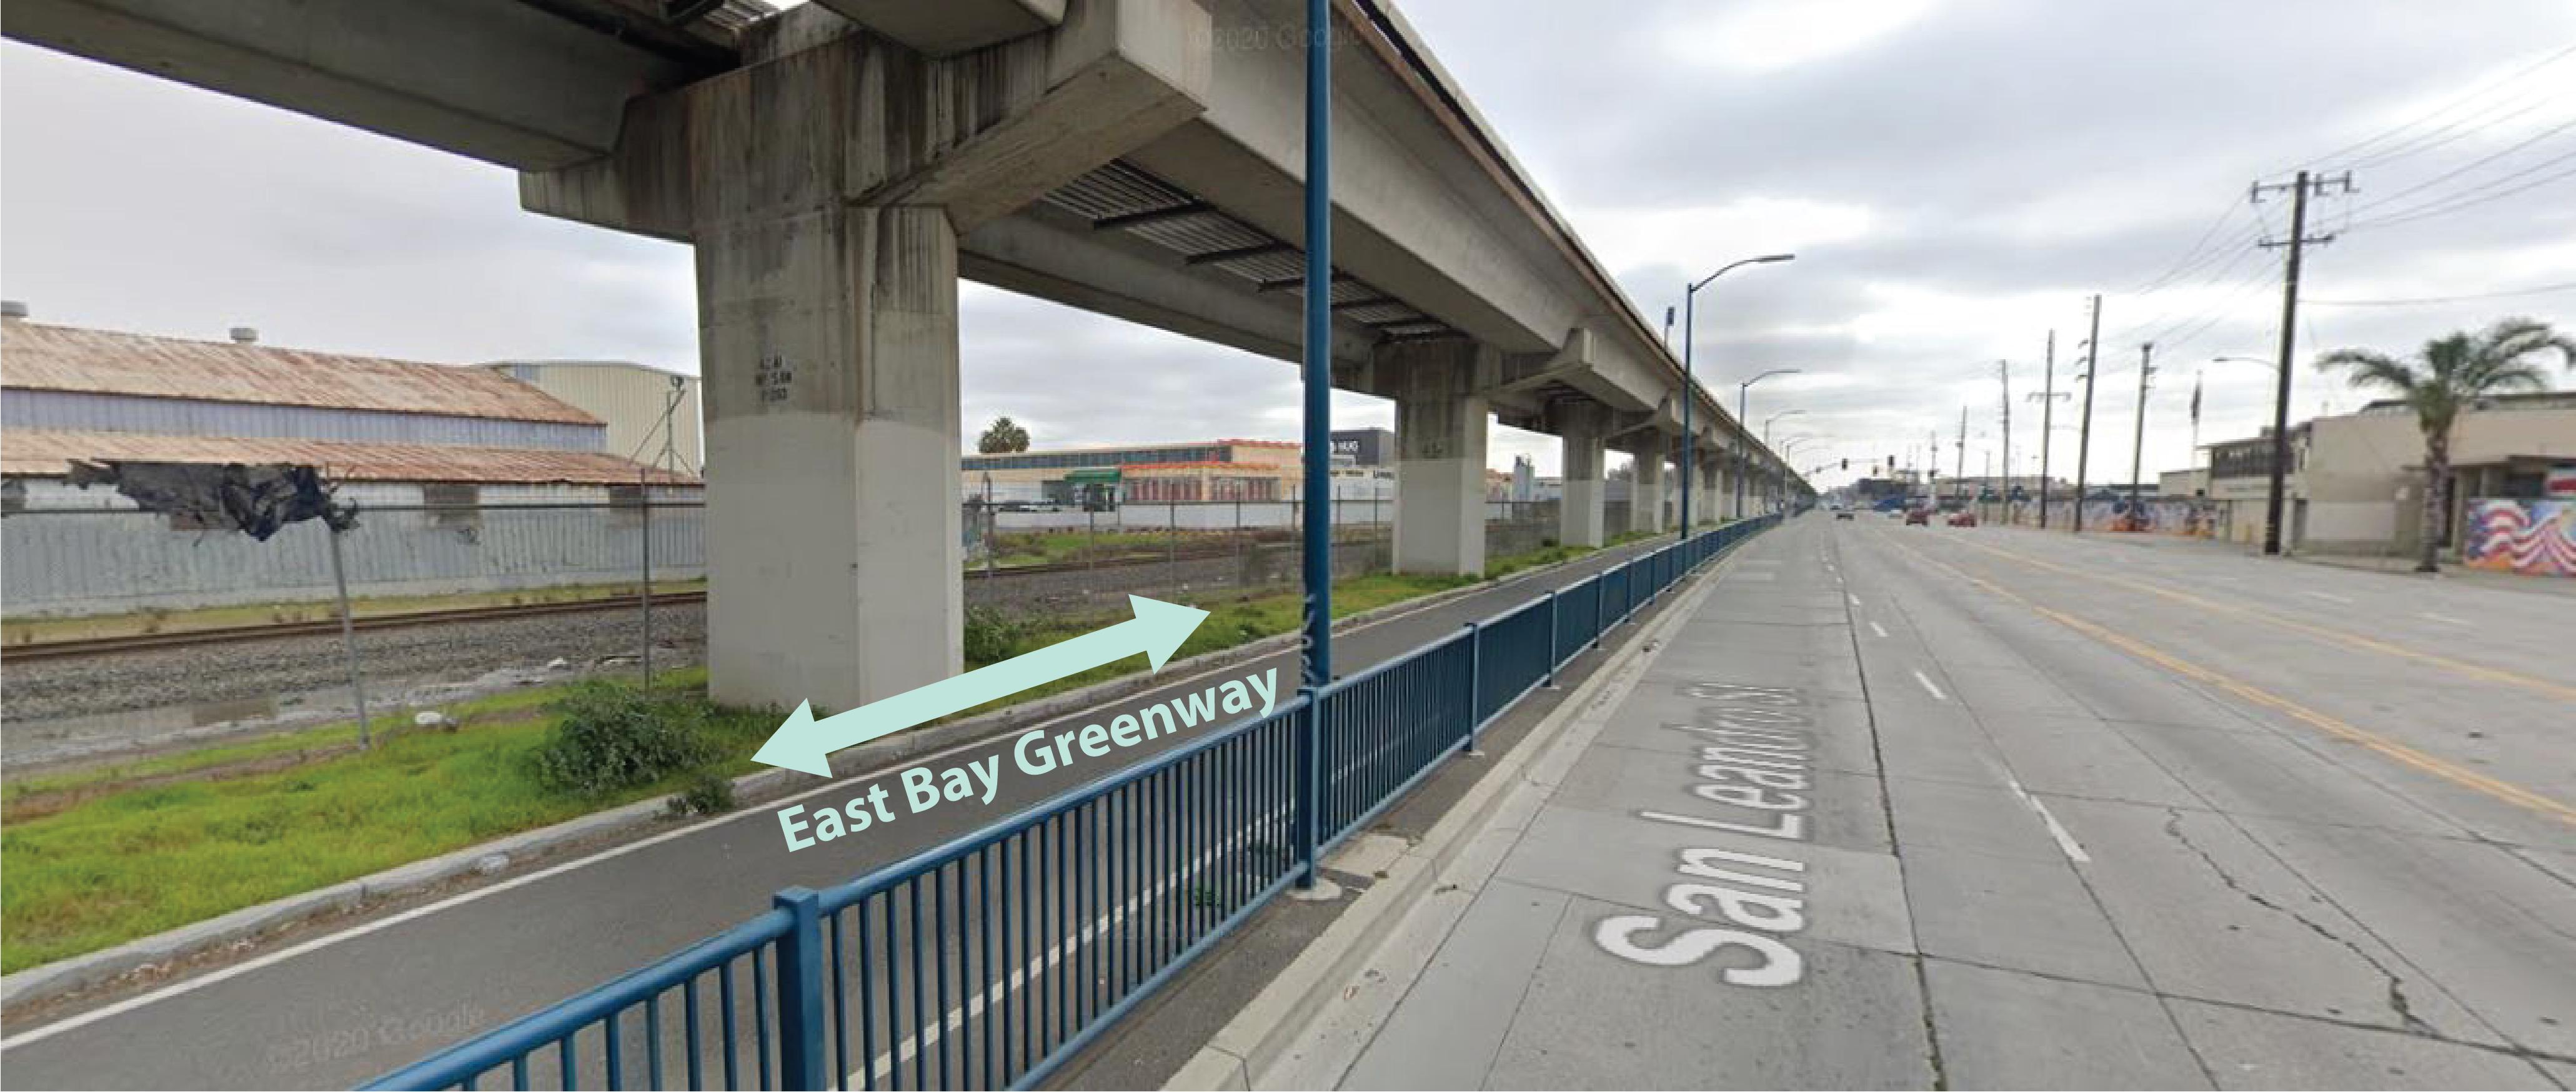 EB Greenway Google map highlighted 01